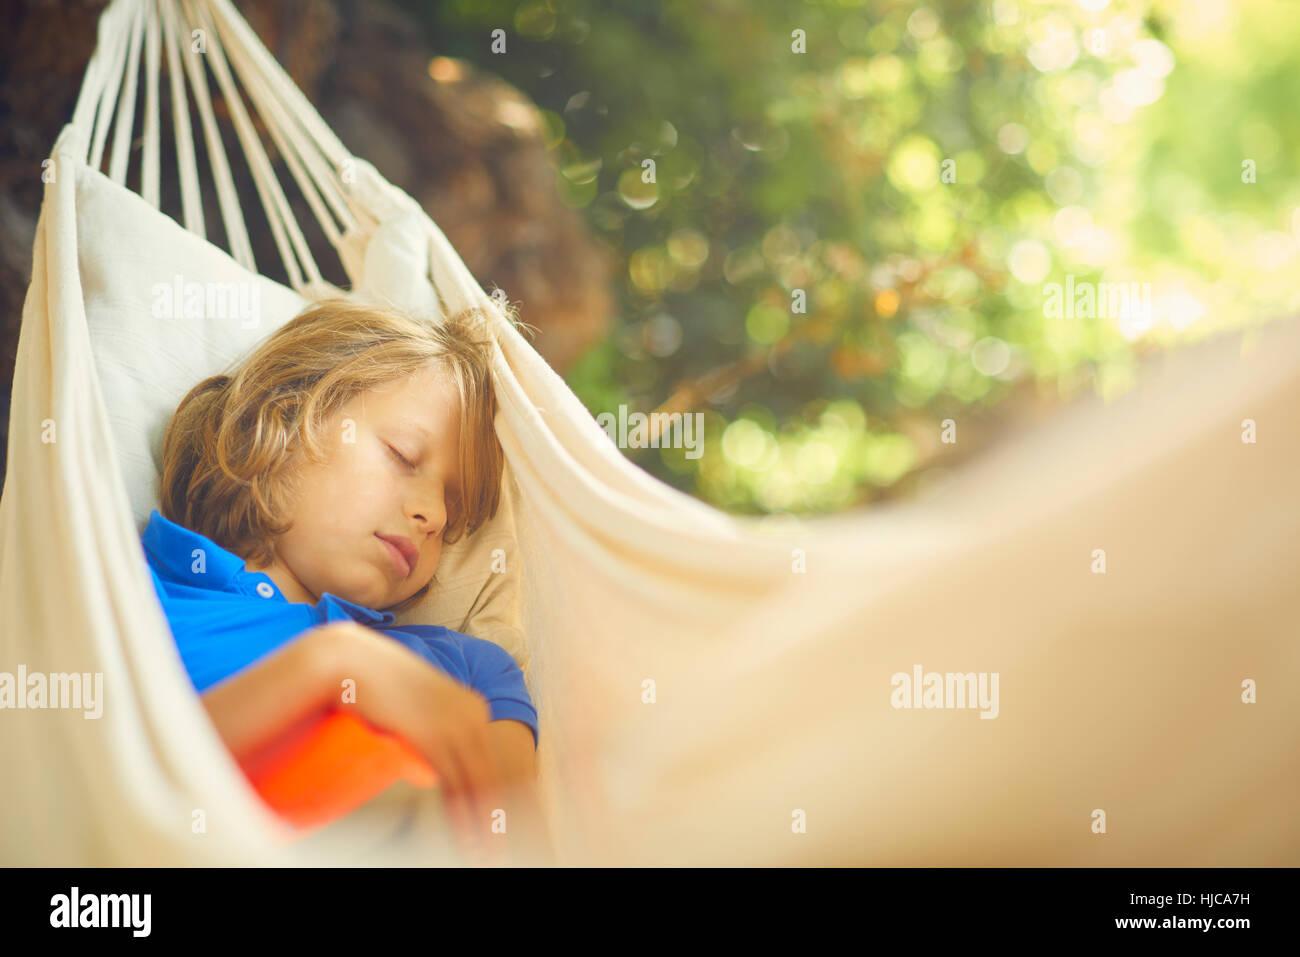 Cute boy reclining in garden hammock asleep - Stock Image